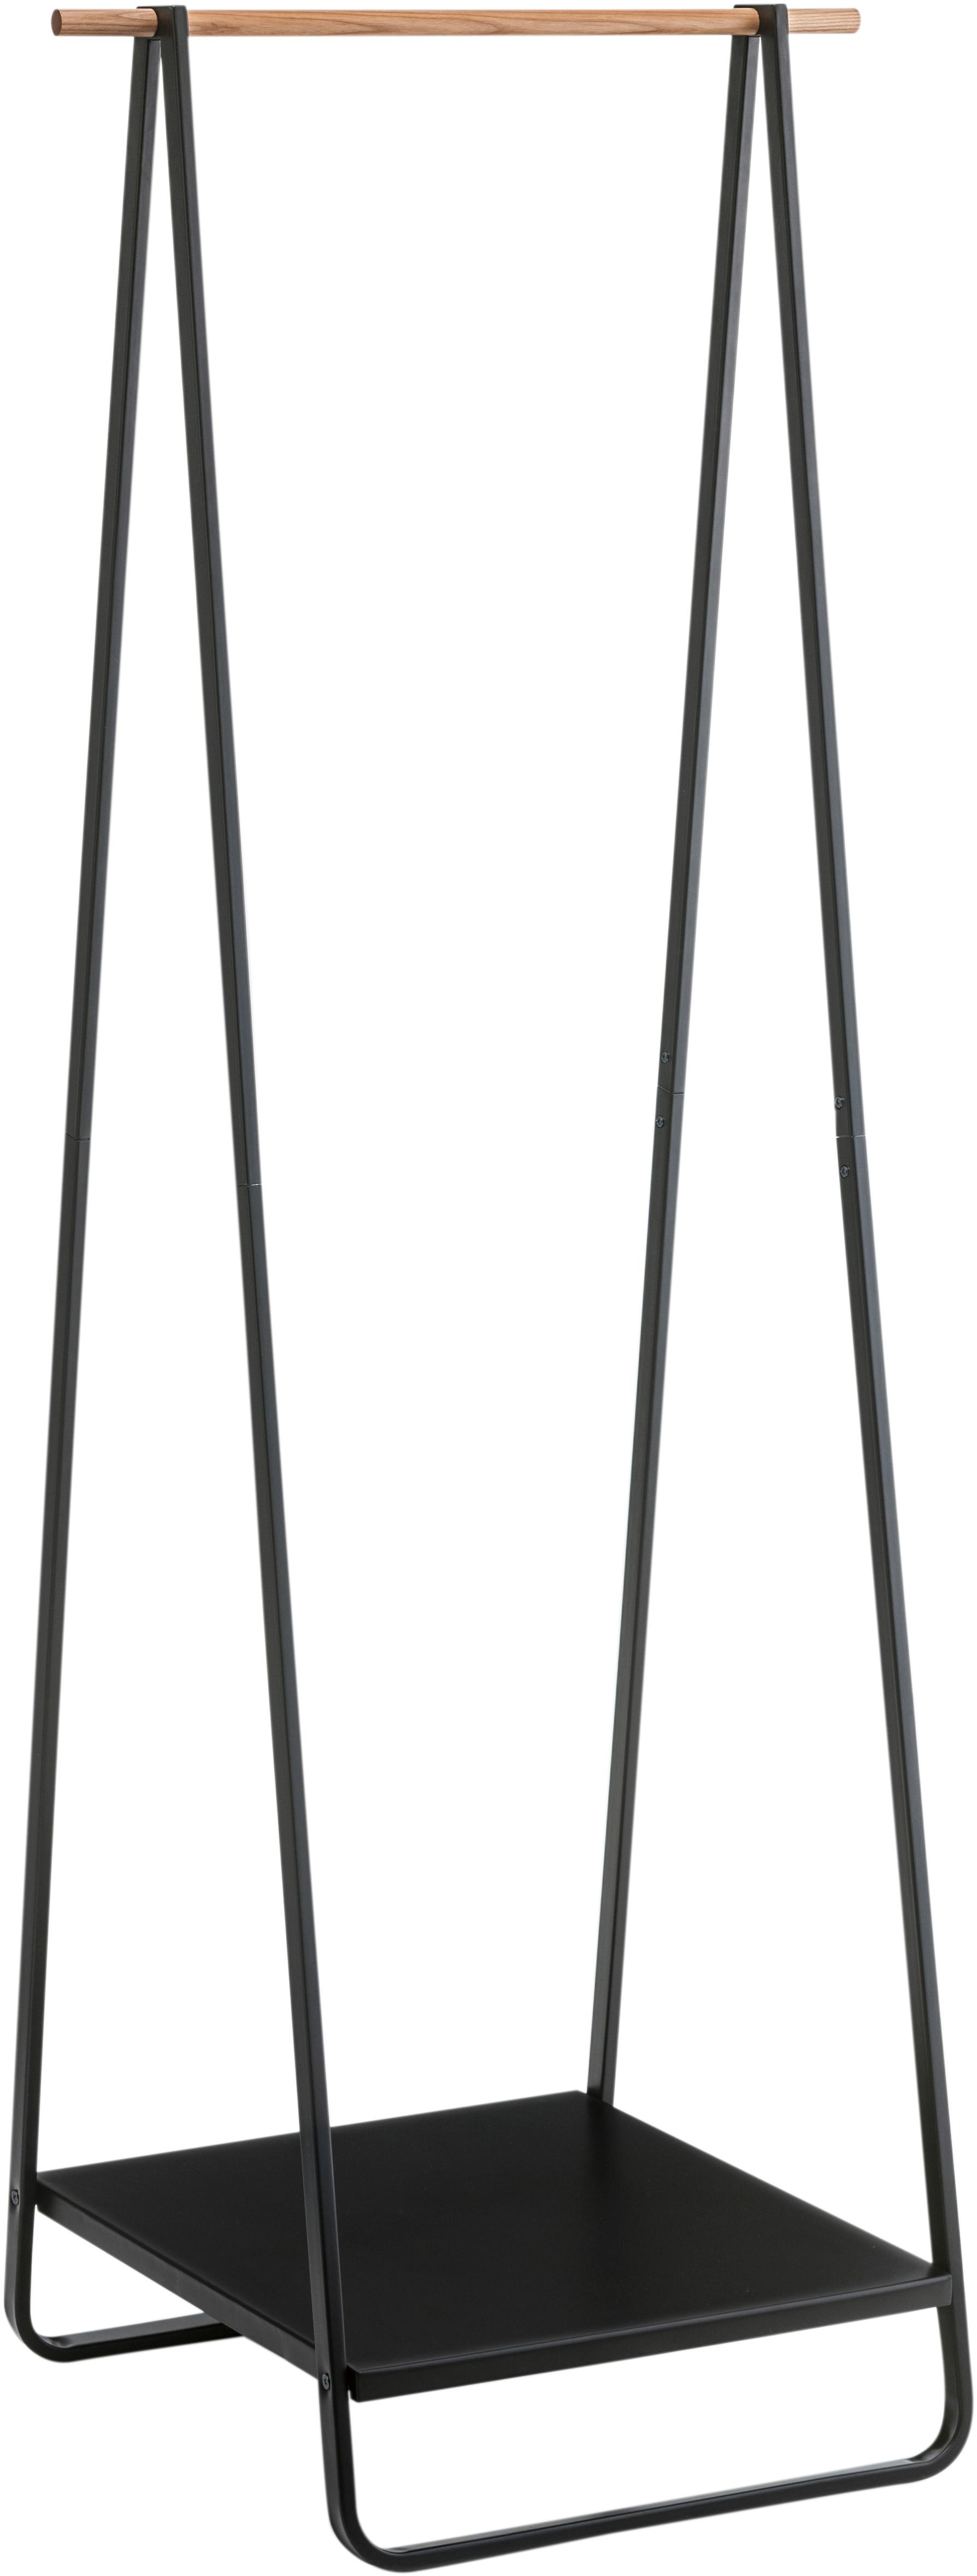 Burro de metal Tower, Estructura: metal con pintura en polv, Barra: madera, Negro, An 52 x Al 140 cm